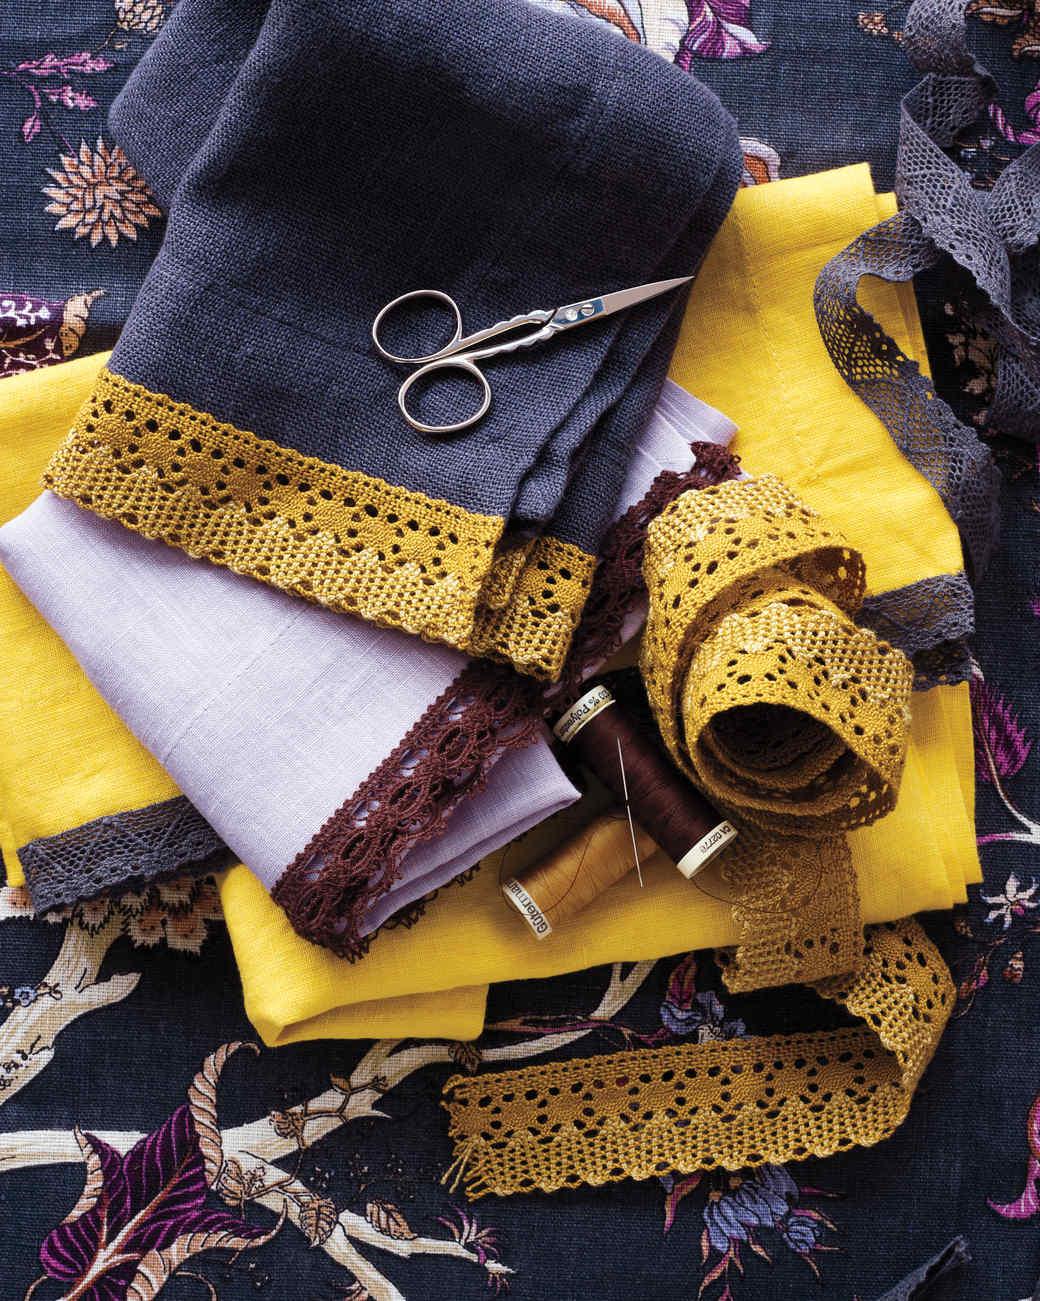 fabric-detail-004-d111429.jpg